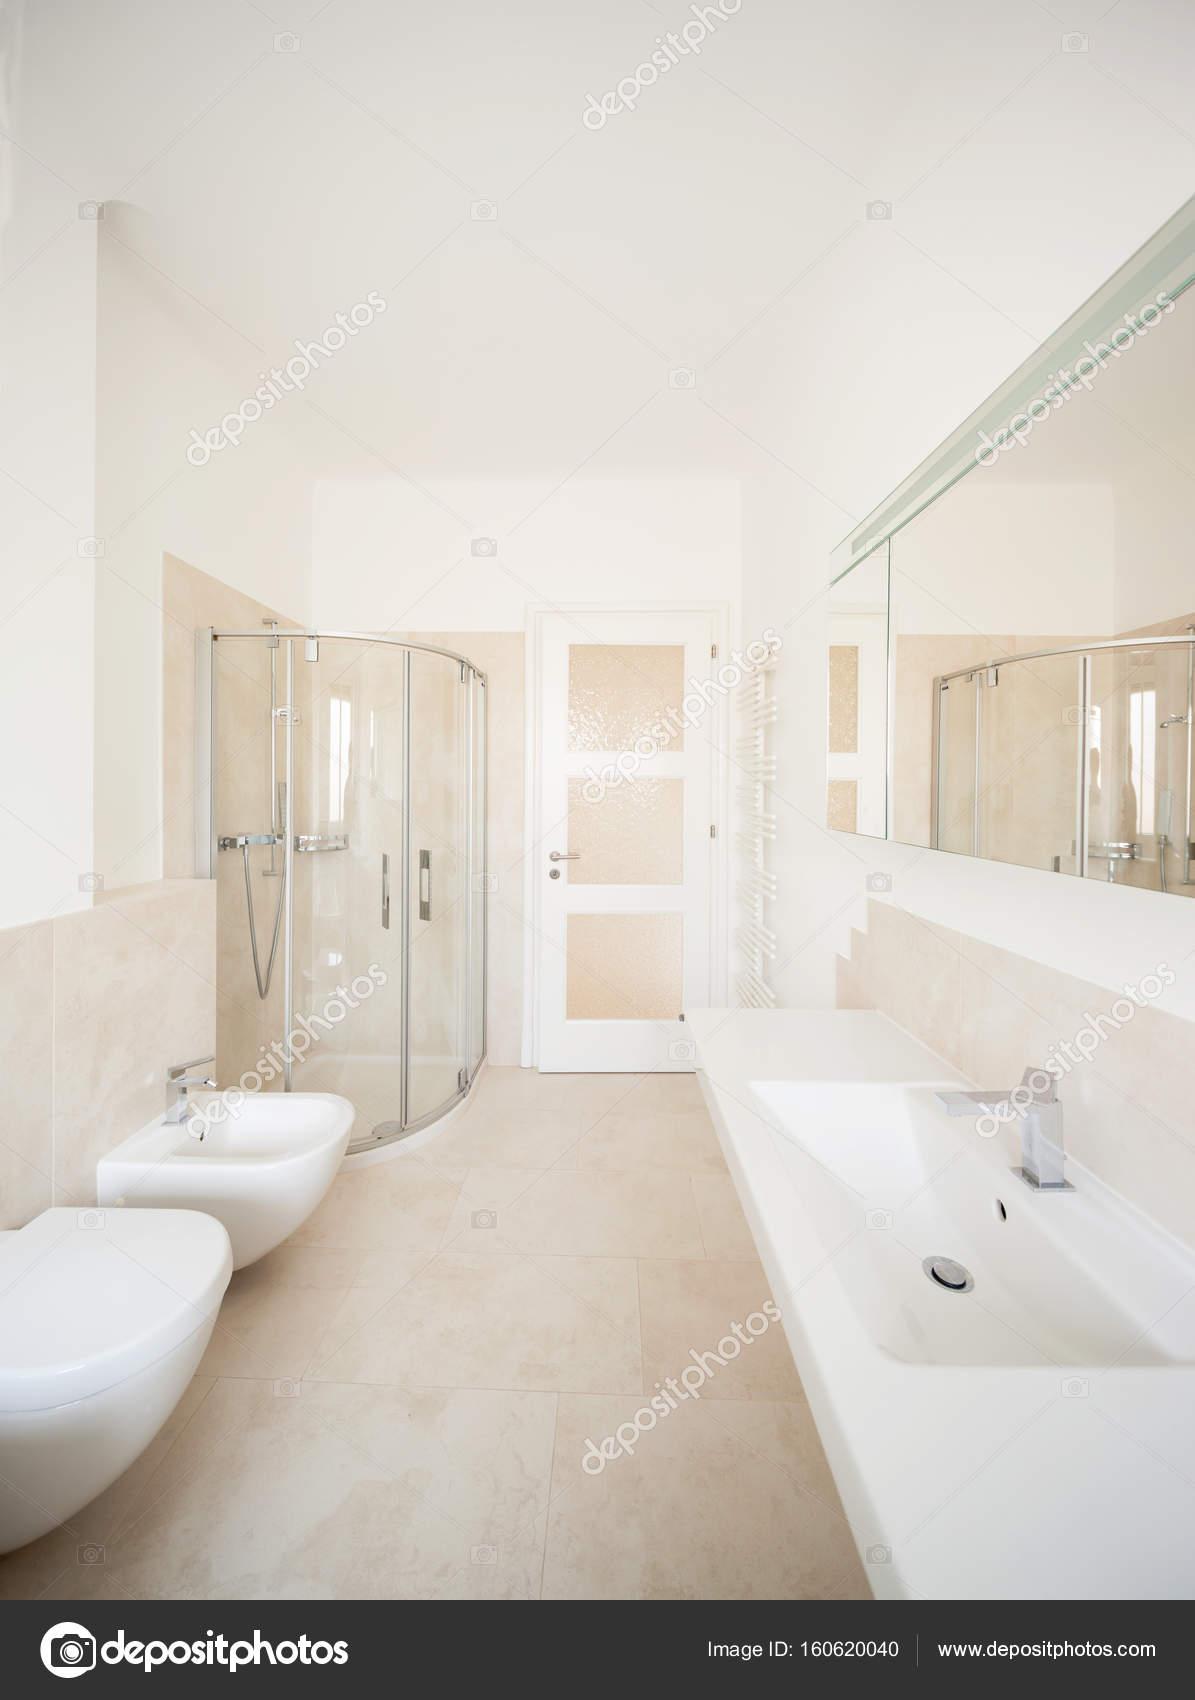 Breed beige badkamer — Stockfoto © Zveiger #160620040